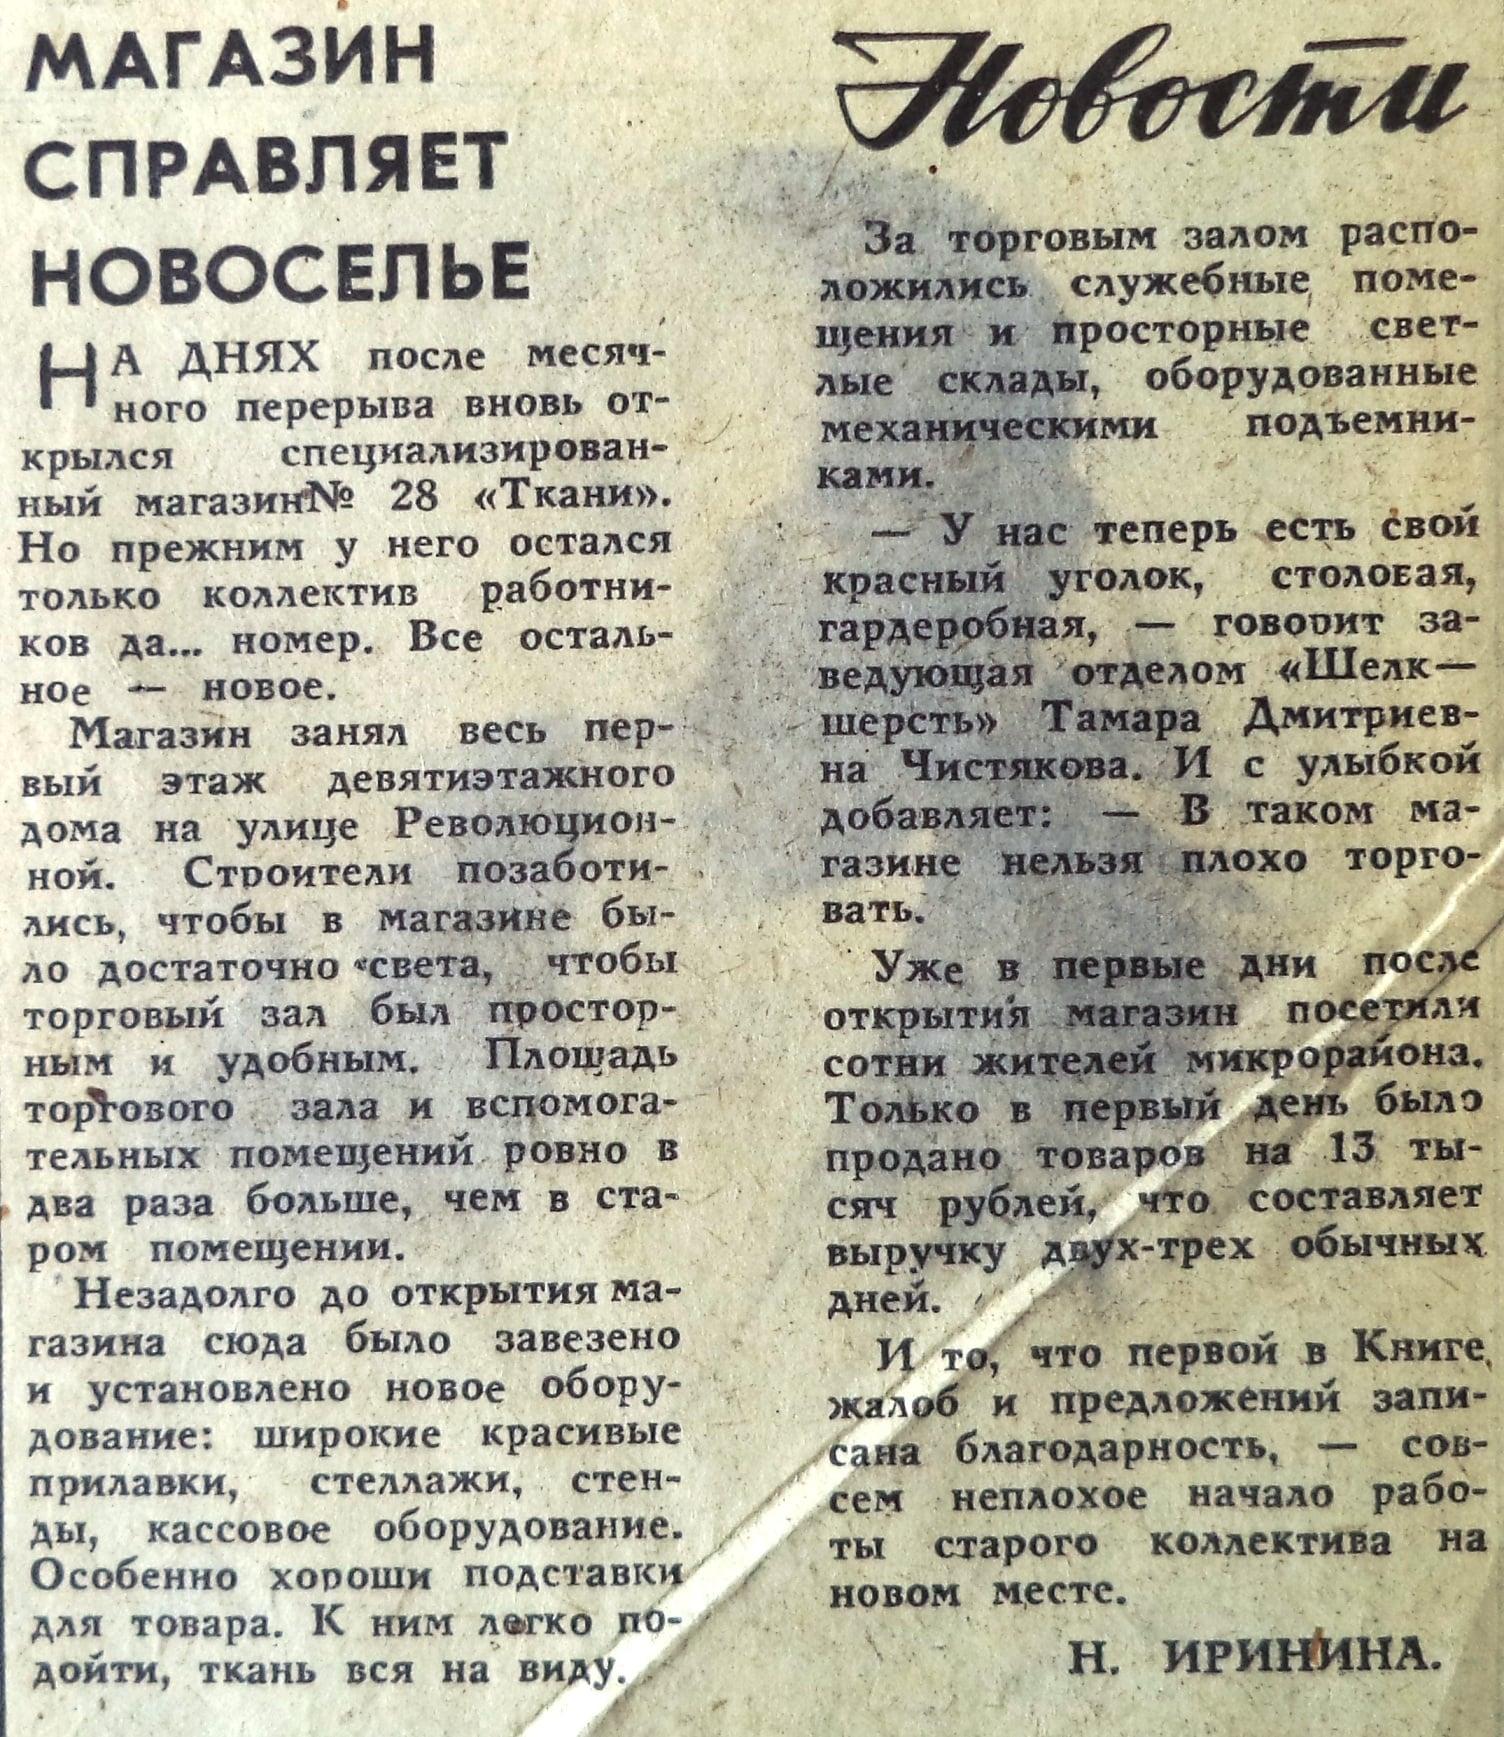 Революционная-ФОТО-80-ВЗя-1969-09-04-новый маг. Ткани на ул. Револ.-min